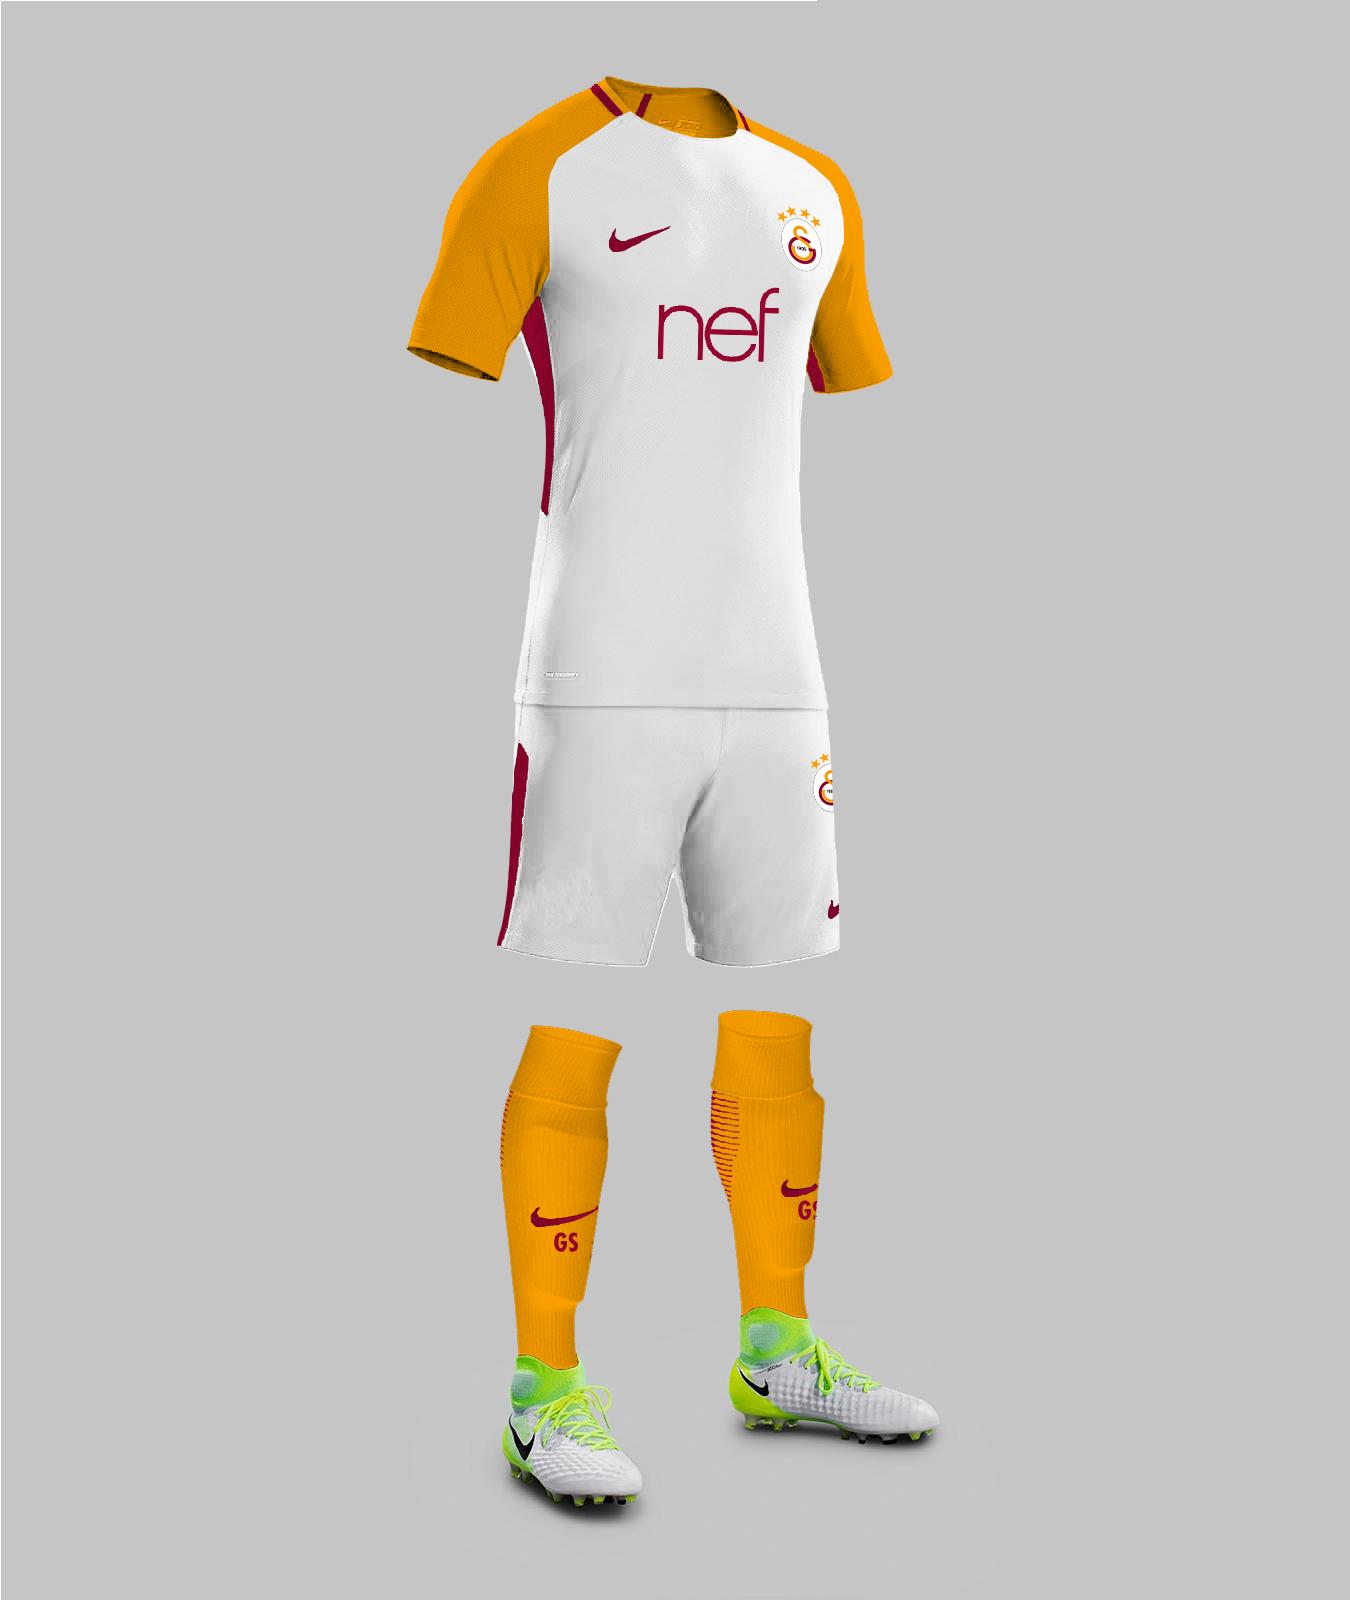 lowest price 3fba7 8ea40 Galatasaray 17/18 Away Kit